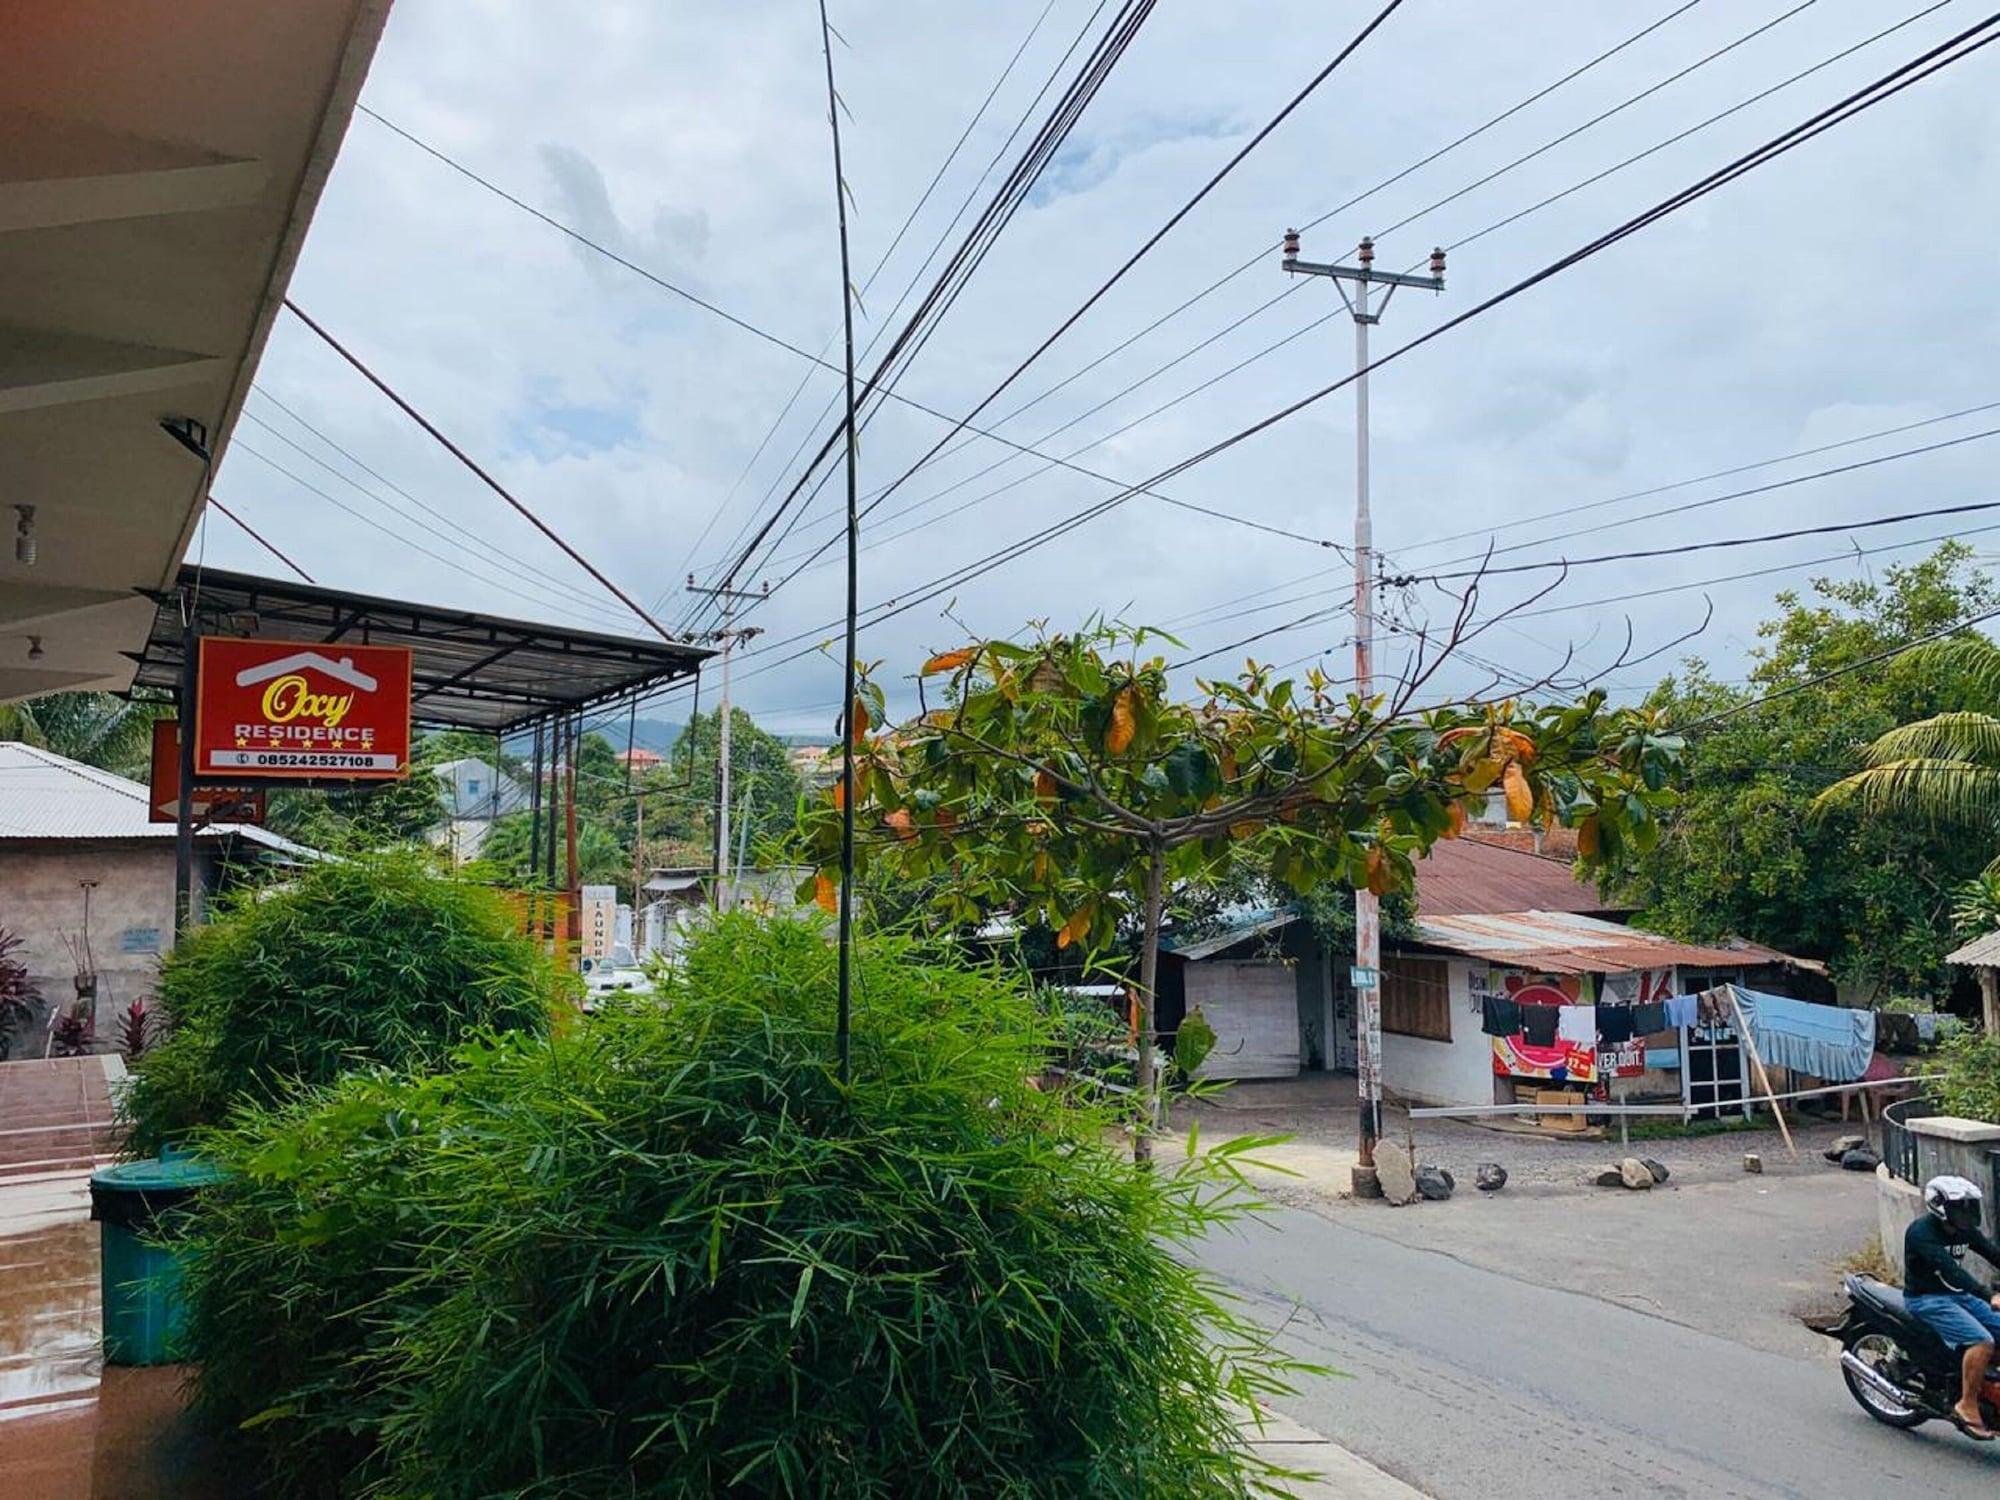 OYO 2639 Oxy Townhouse, Manado